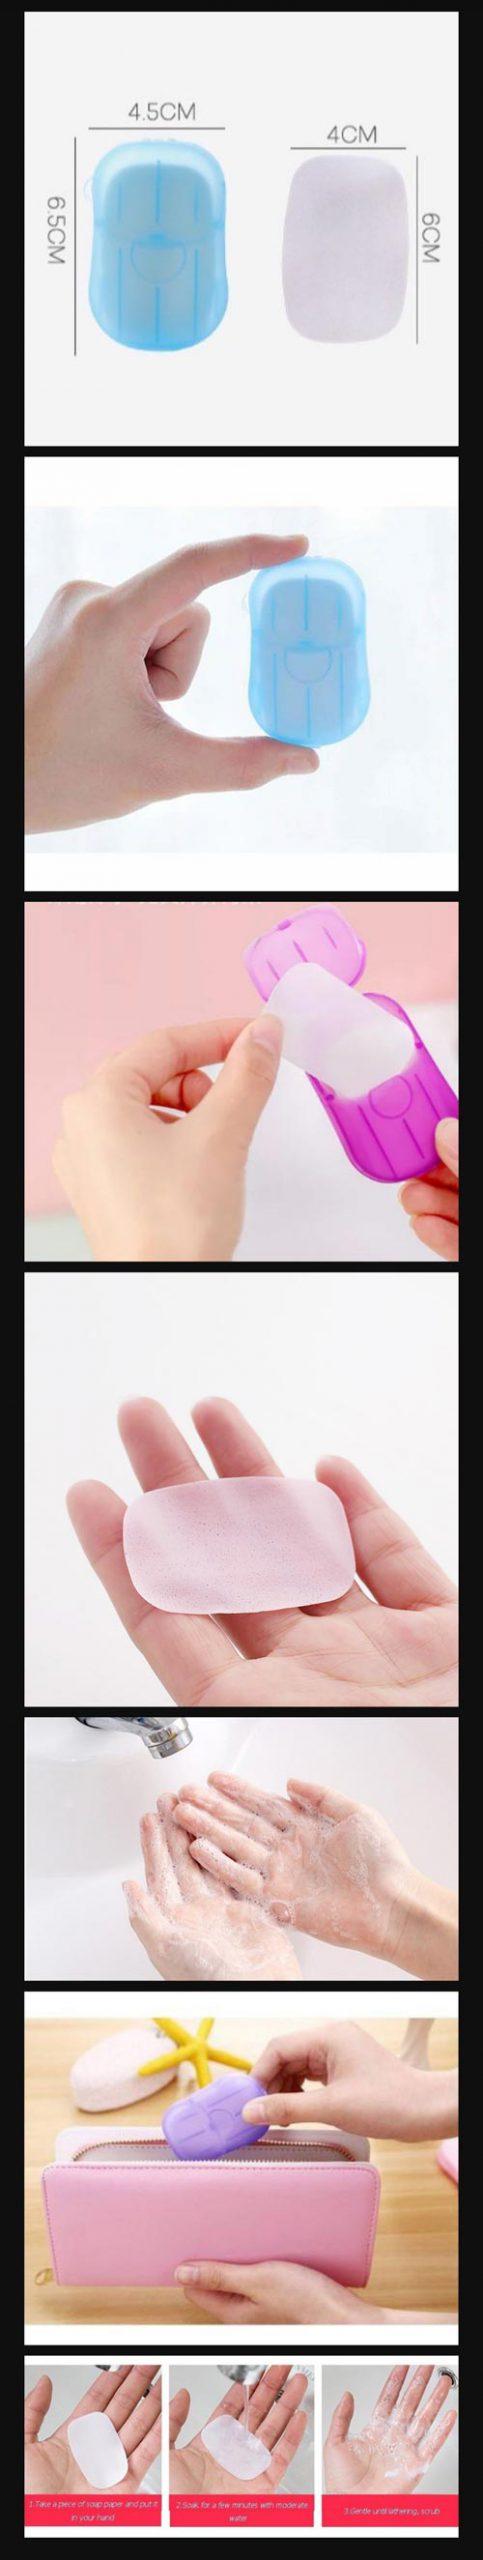 New Paper Soap